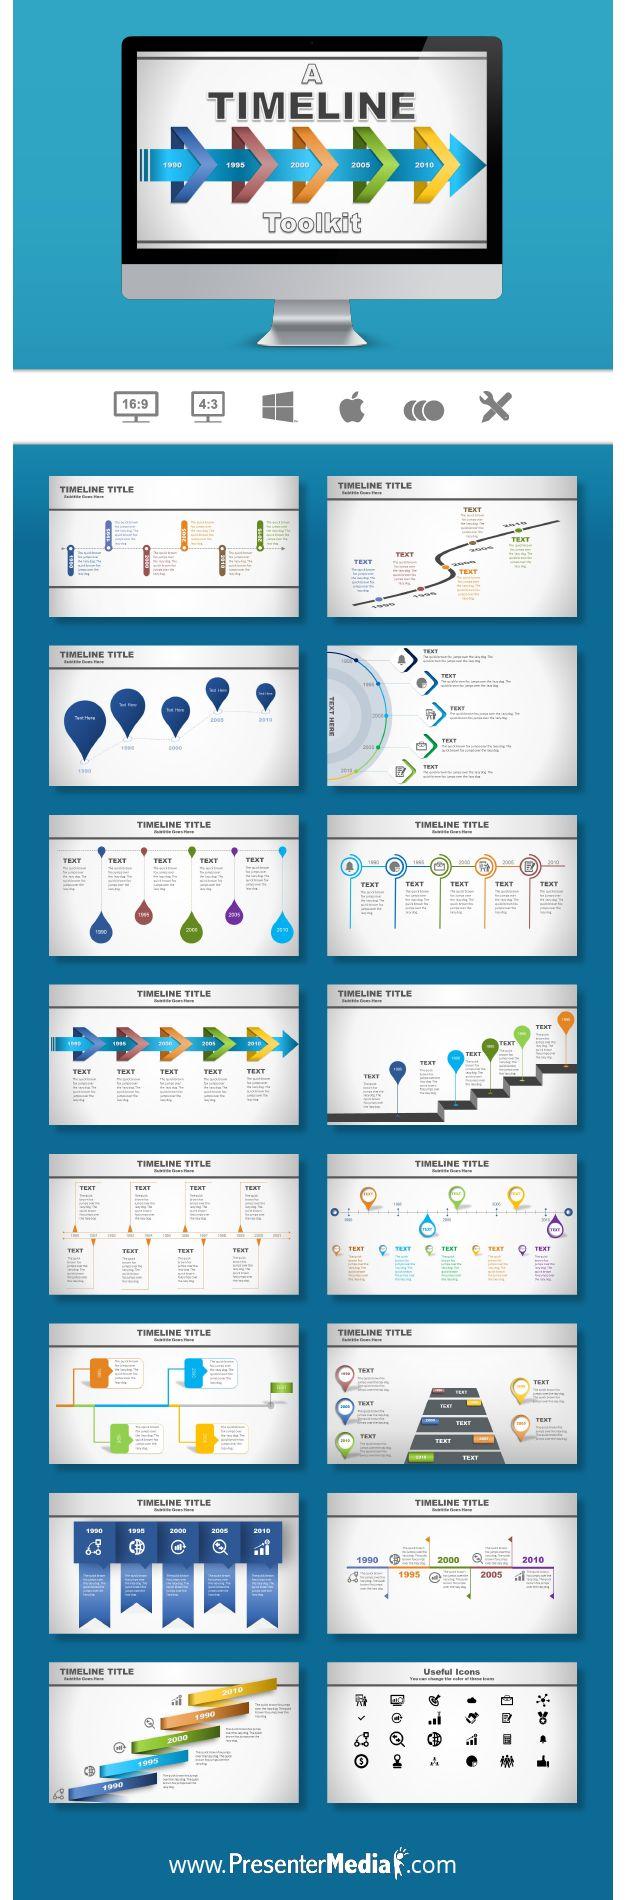 Timeline Toolkit Presentation Template #PowerPoint #Timeline #Presentation http://bit.ly/2bAQMrz